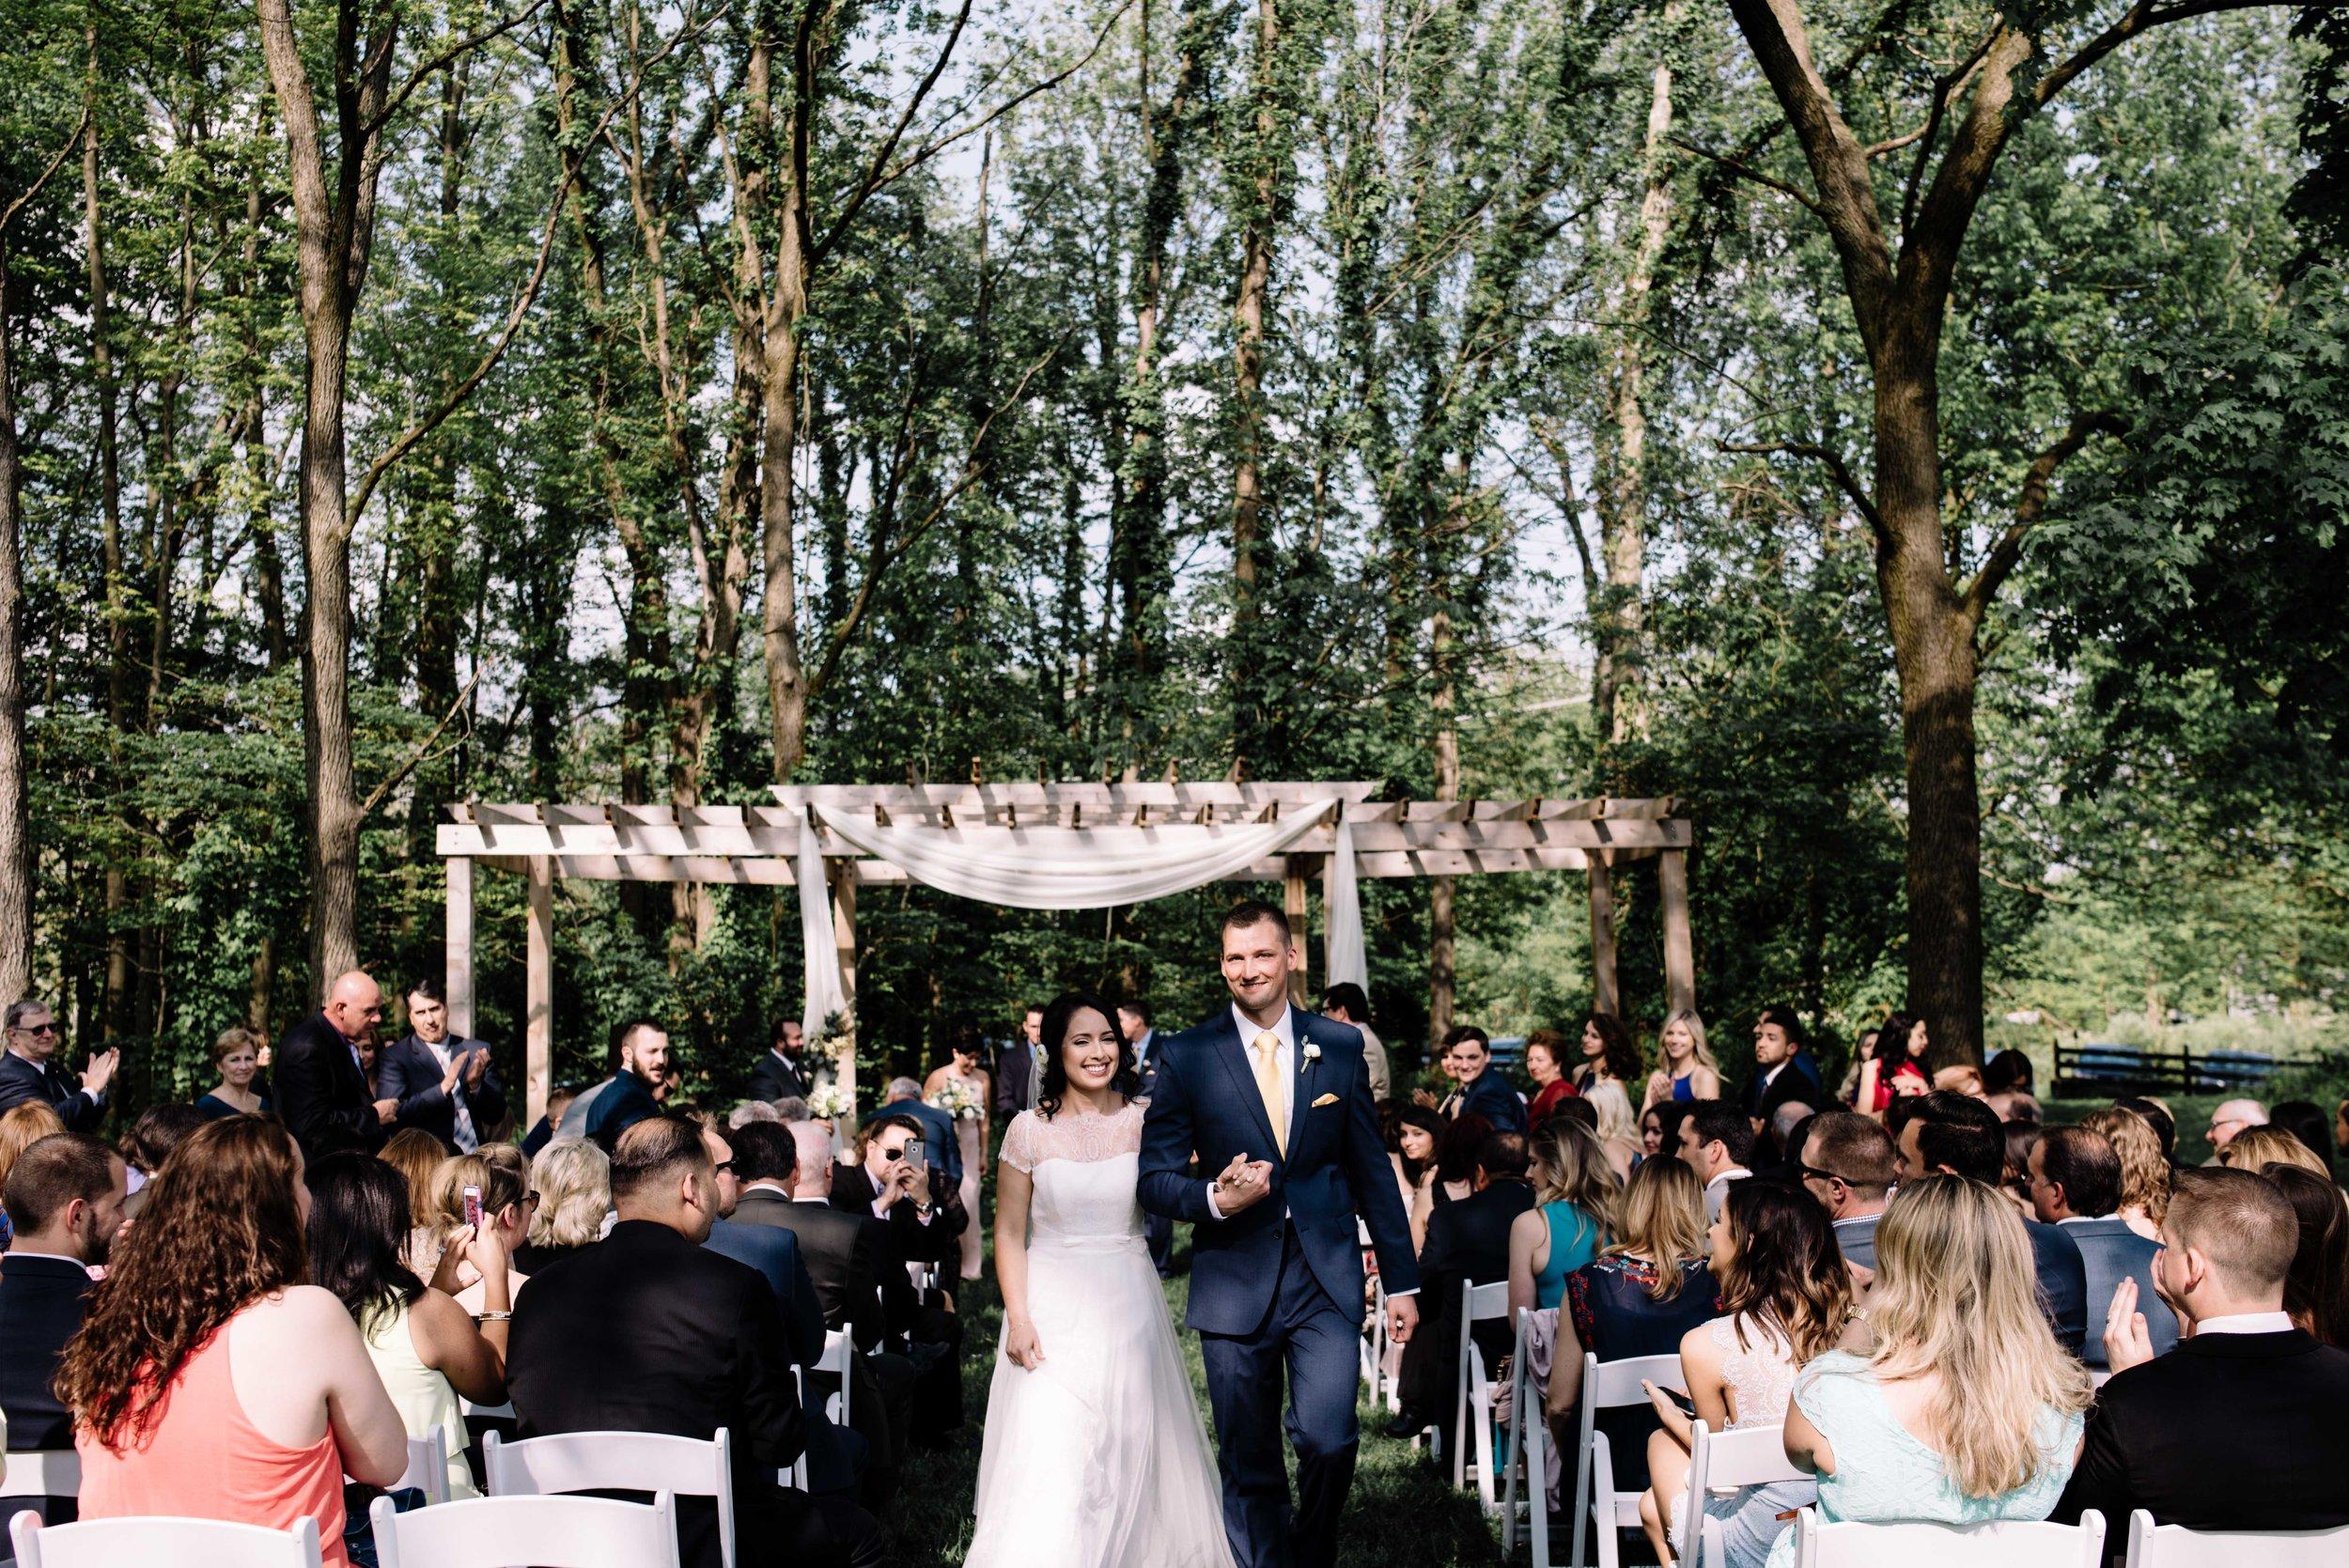 Ana-Dan-Blog-Indianapolis-Wedding-49.jpg